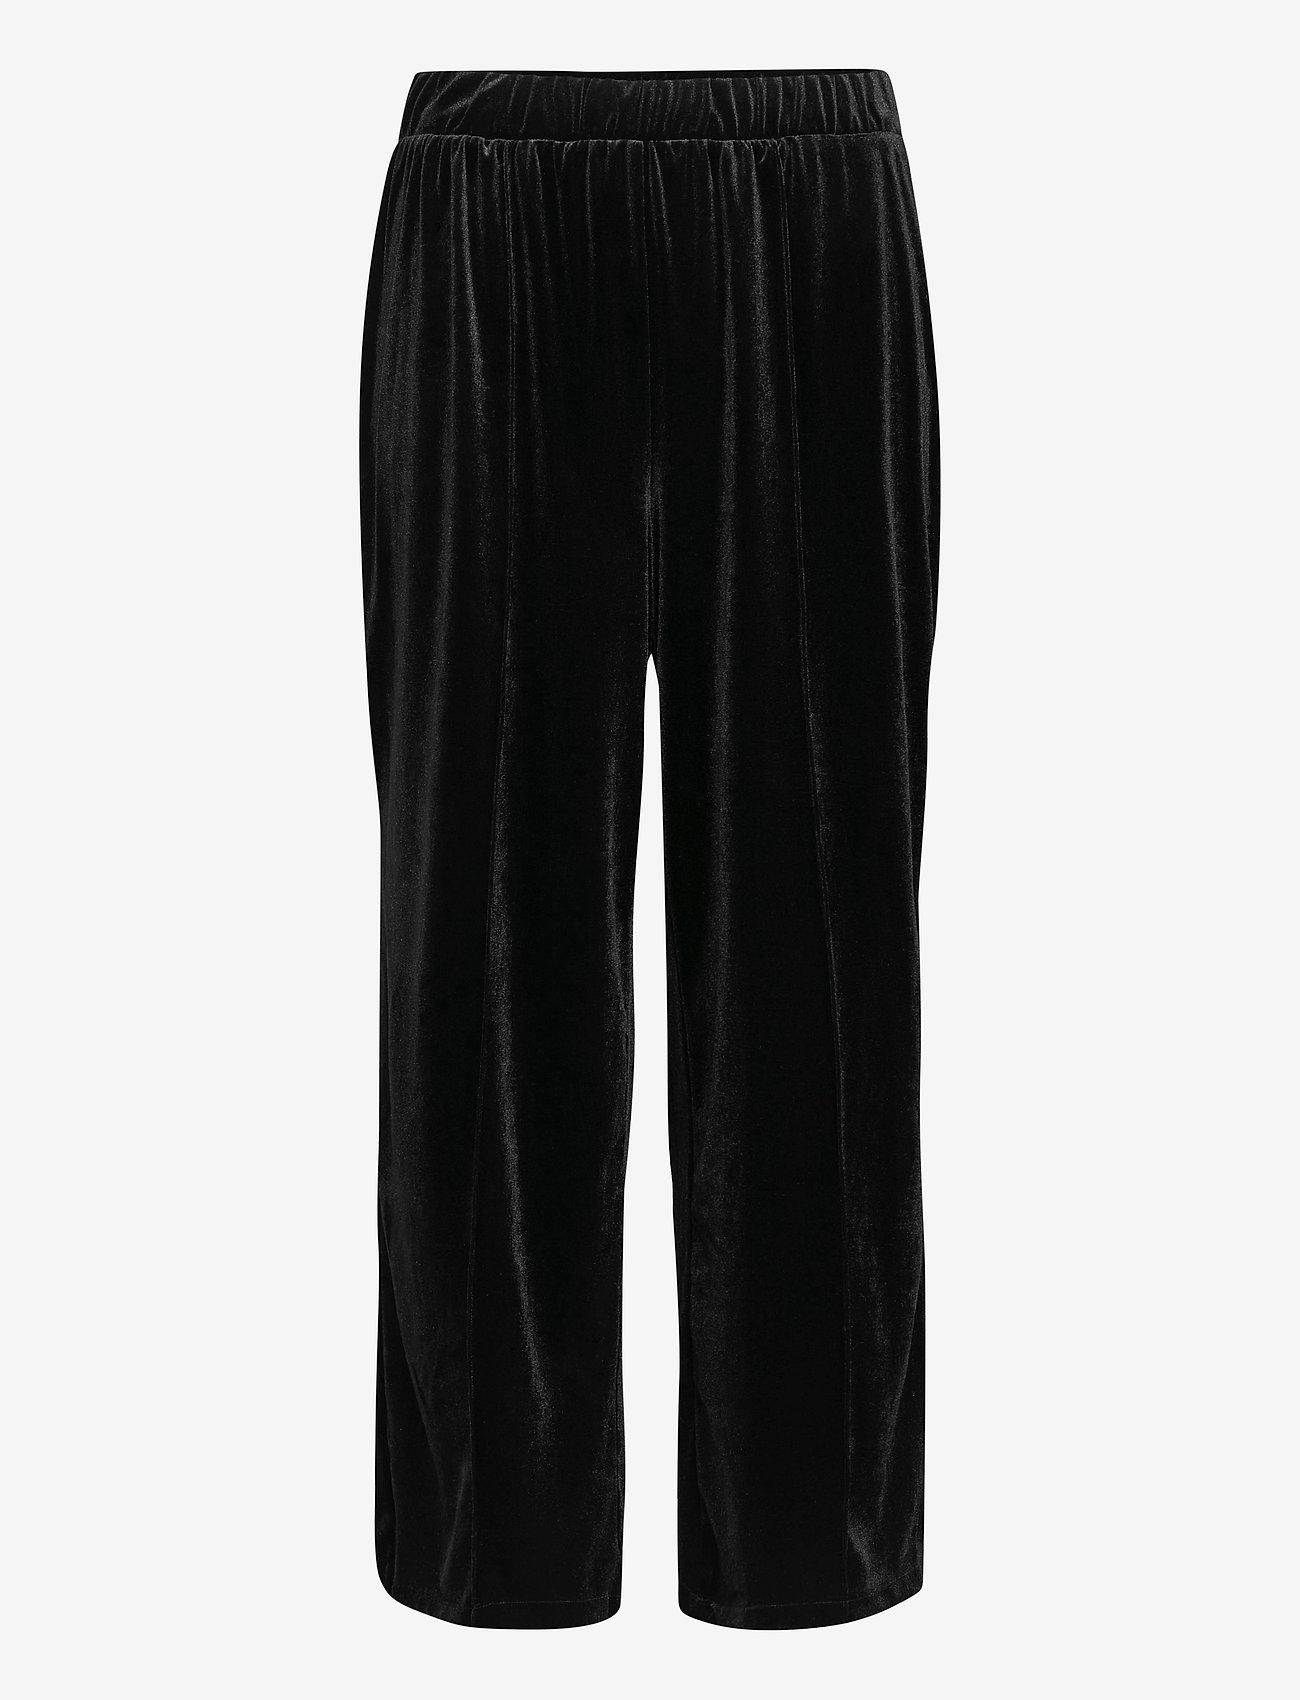 Zizzi - Pants Velvet Plus Size Loose Fit Elastic Waistband - casual shorts - black - 0